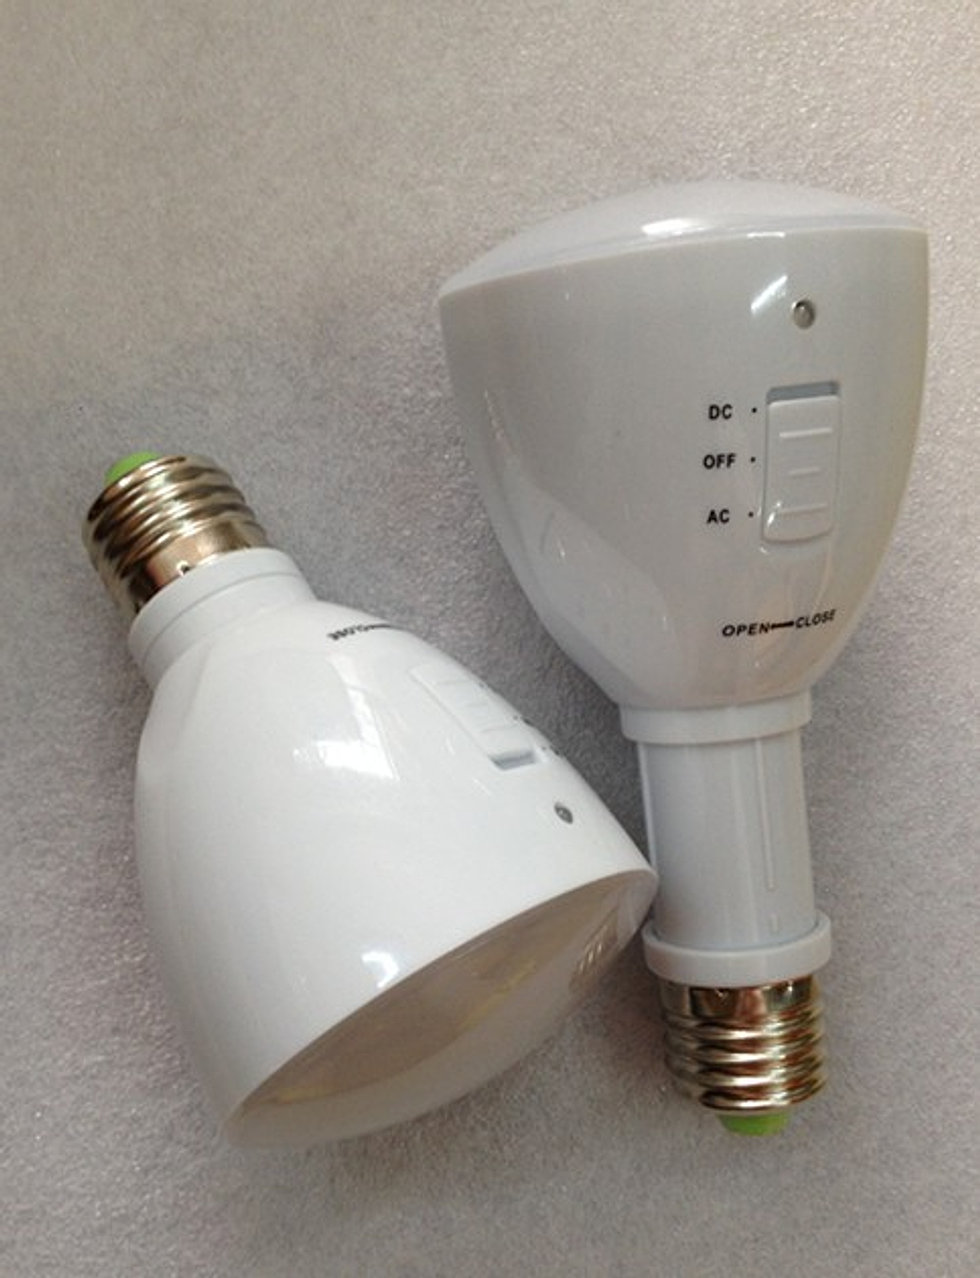 ampoule led n on led rechargeable aimant. Black Bedroom Furniture Sets. Home Design Ideas